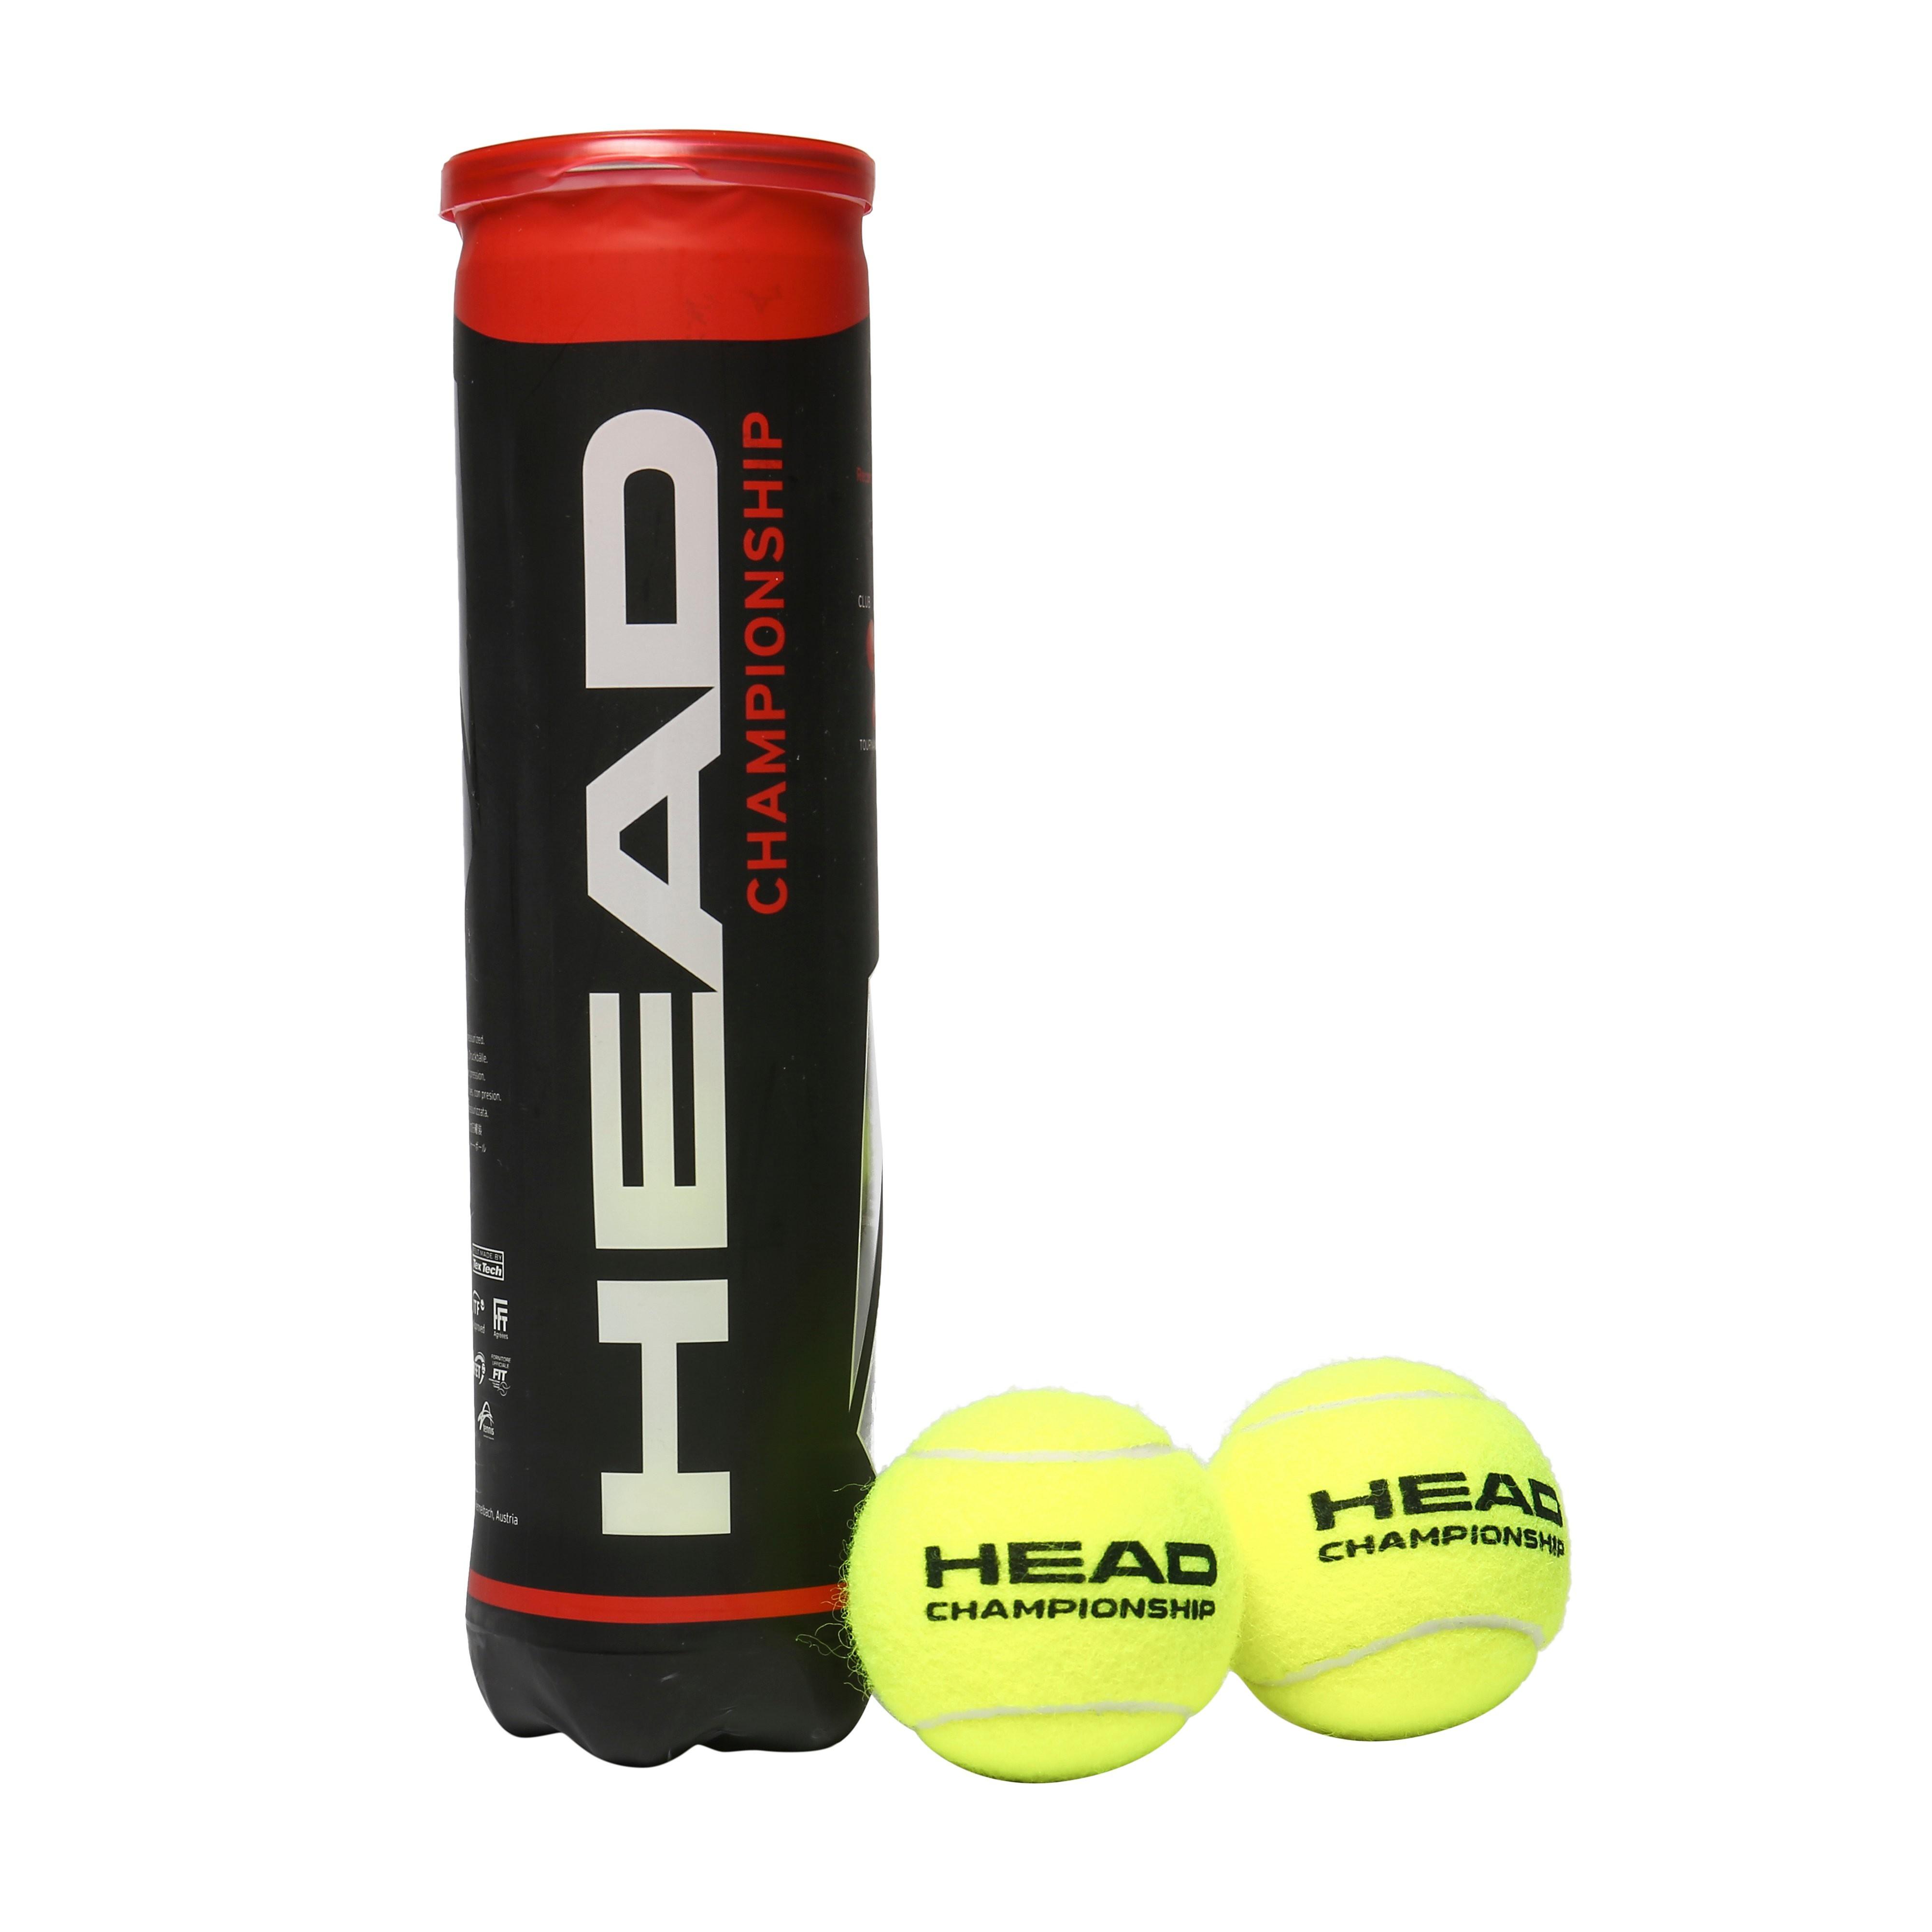 Head Championship 3 Ball Tube